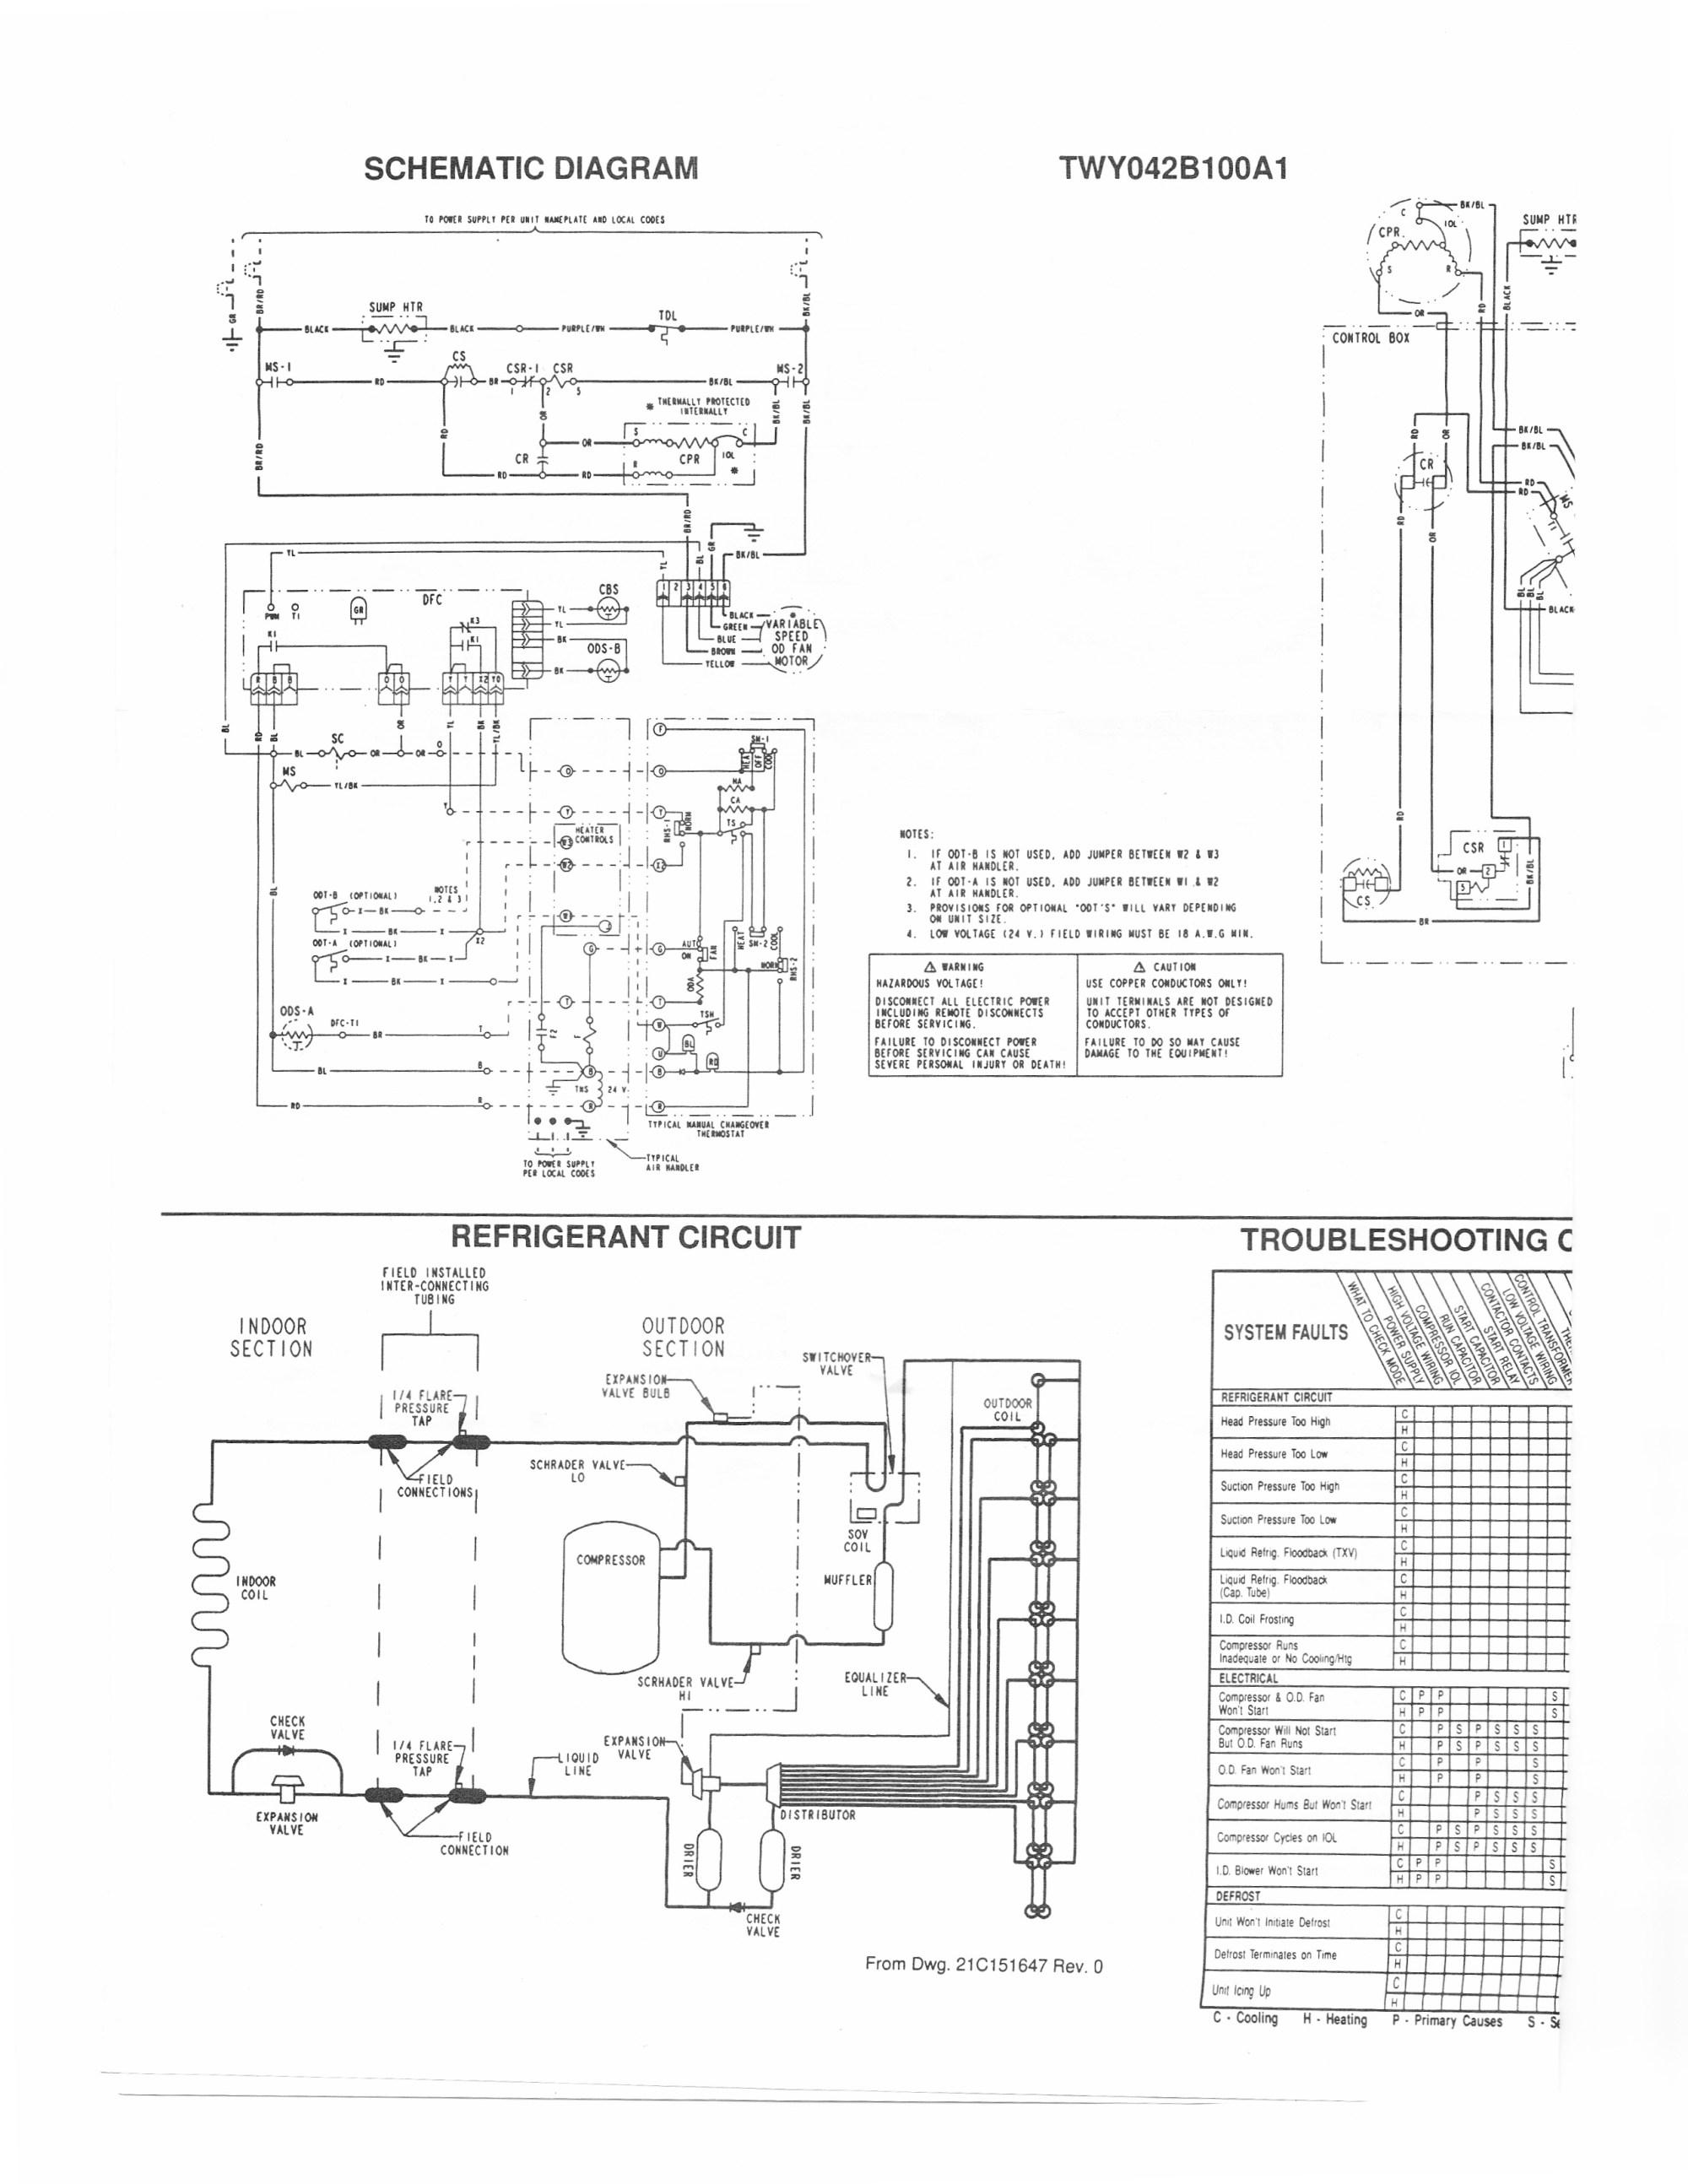 hight resolution of trane heat pump wiring diagram trane air conditioner wiring schematic handler diagram for solidfonts new